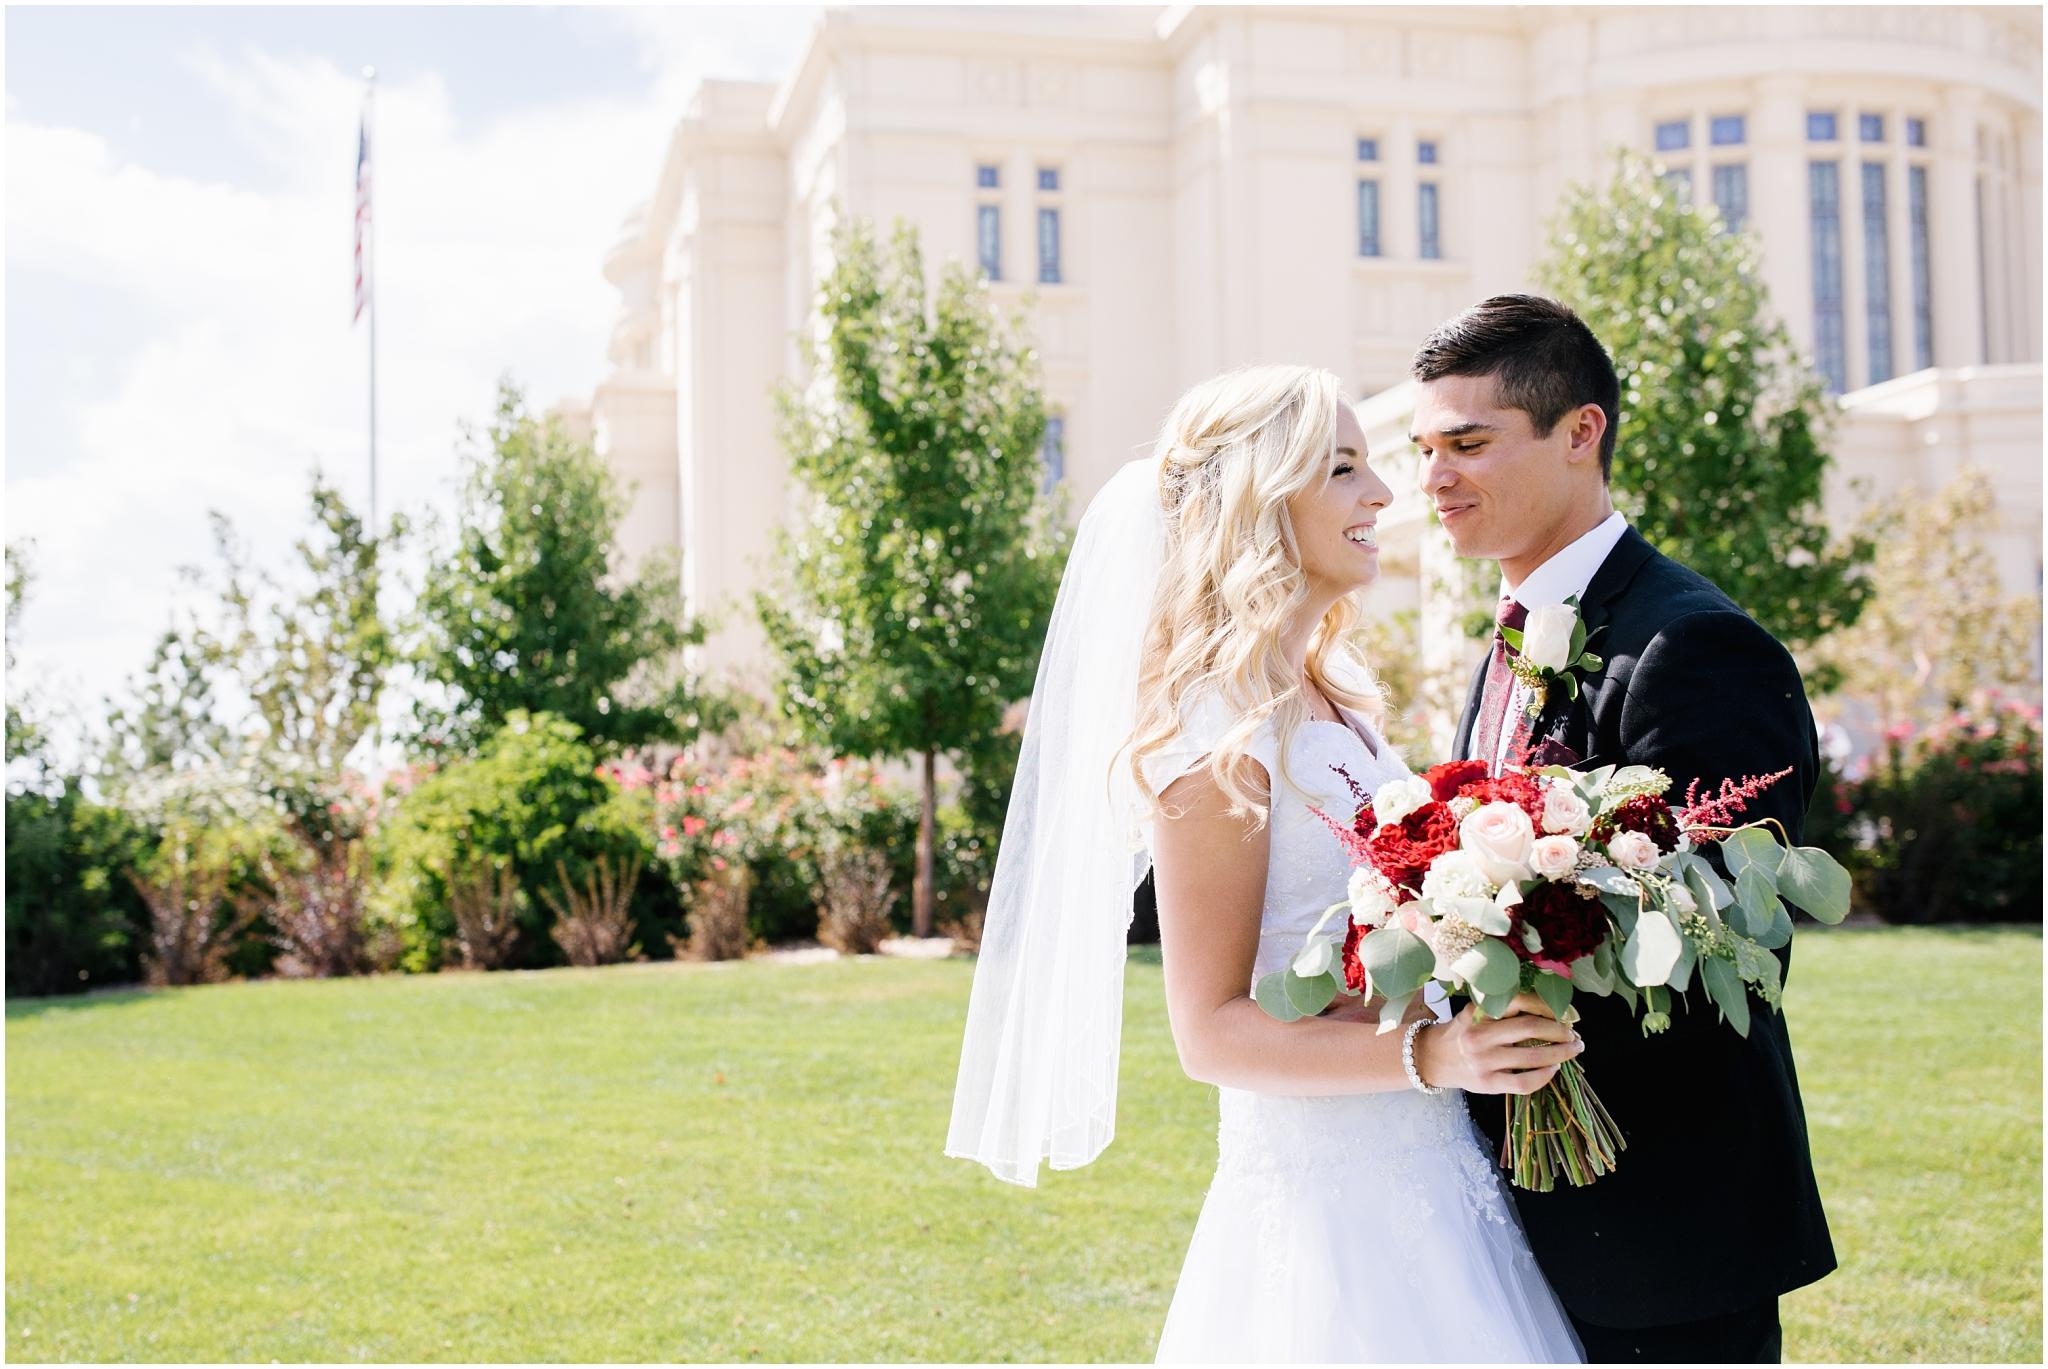 HannahChaseWedding-167_Lizzie-B-Imagery-Utah-Wedding-Photographer-Park-City-Salt-Lake-City-Payson-Temple-Clarion-Garden-Center.jpg